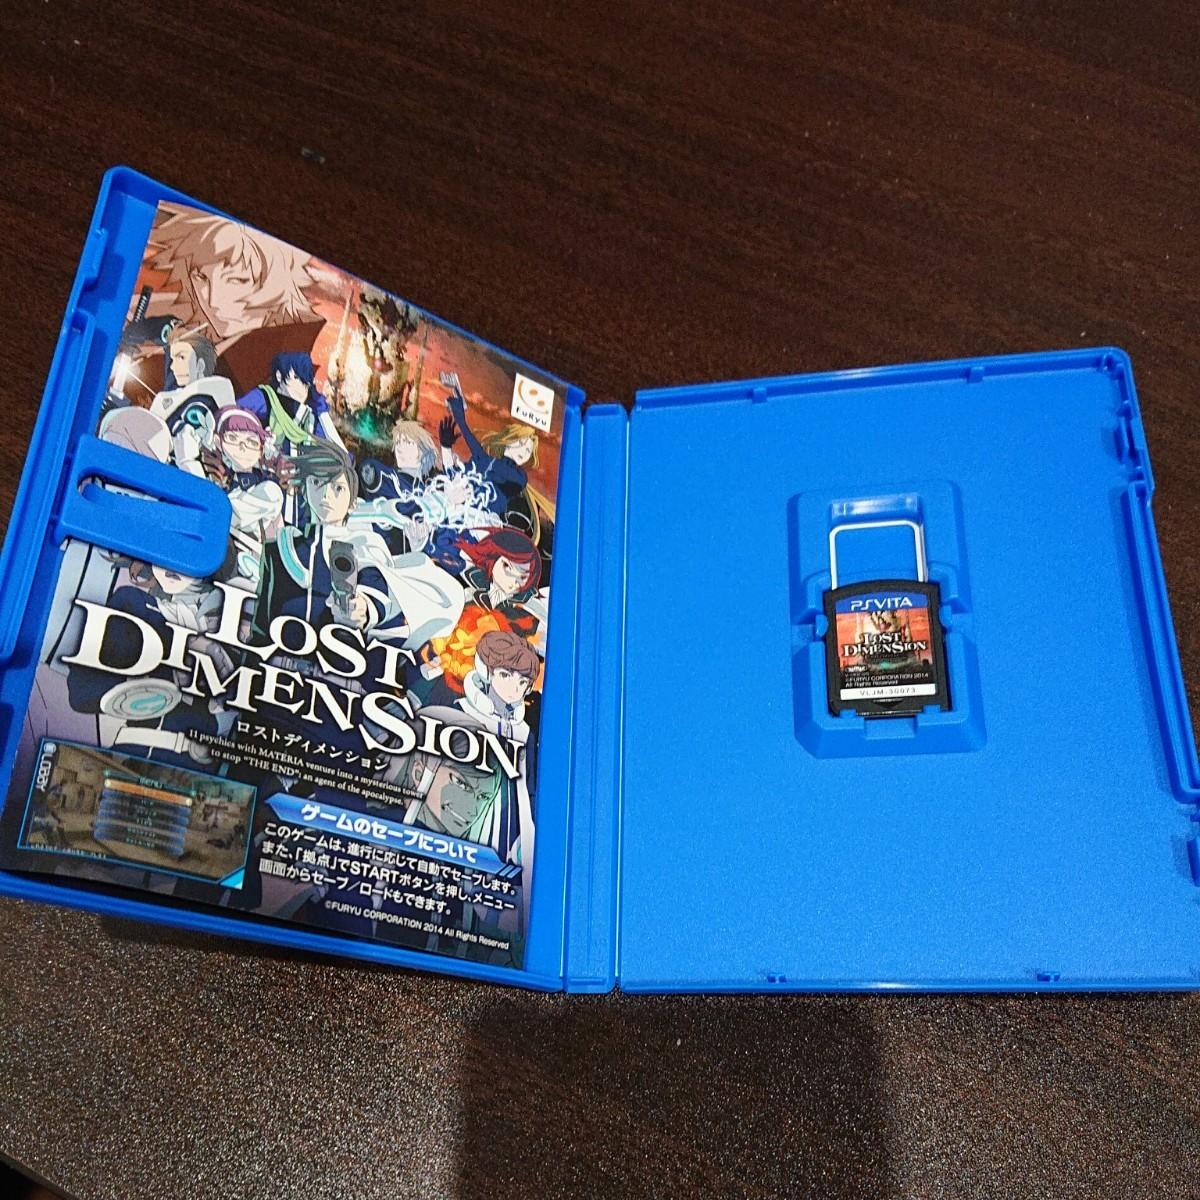 PS Vita ロストディメンション